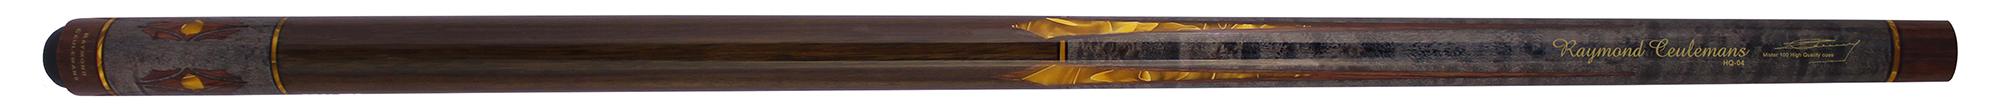 CK0477: Carambole keu Raymond Ceulemans HQ-04 met extra 67cm top #1